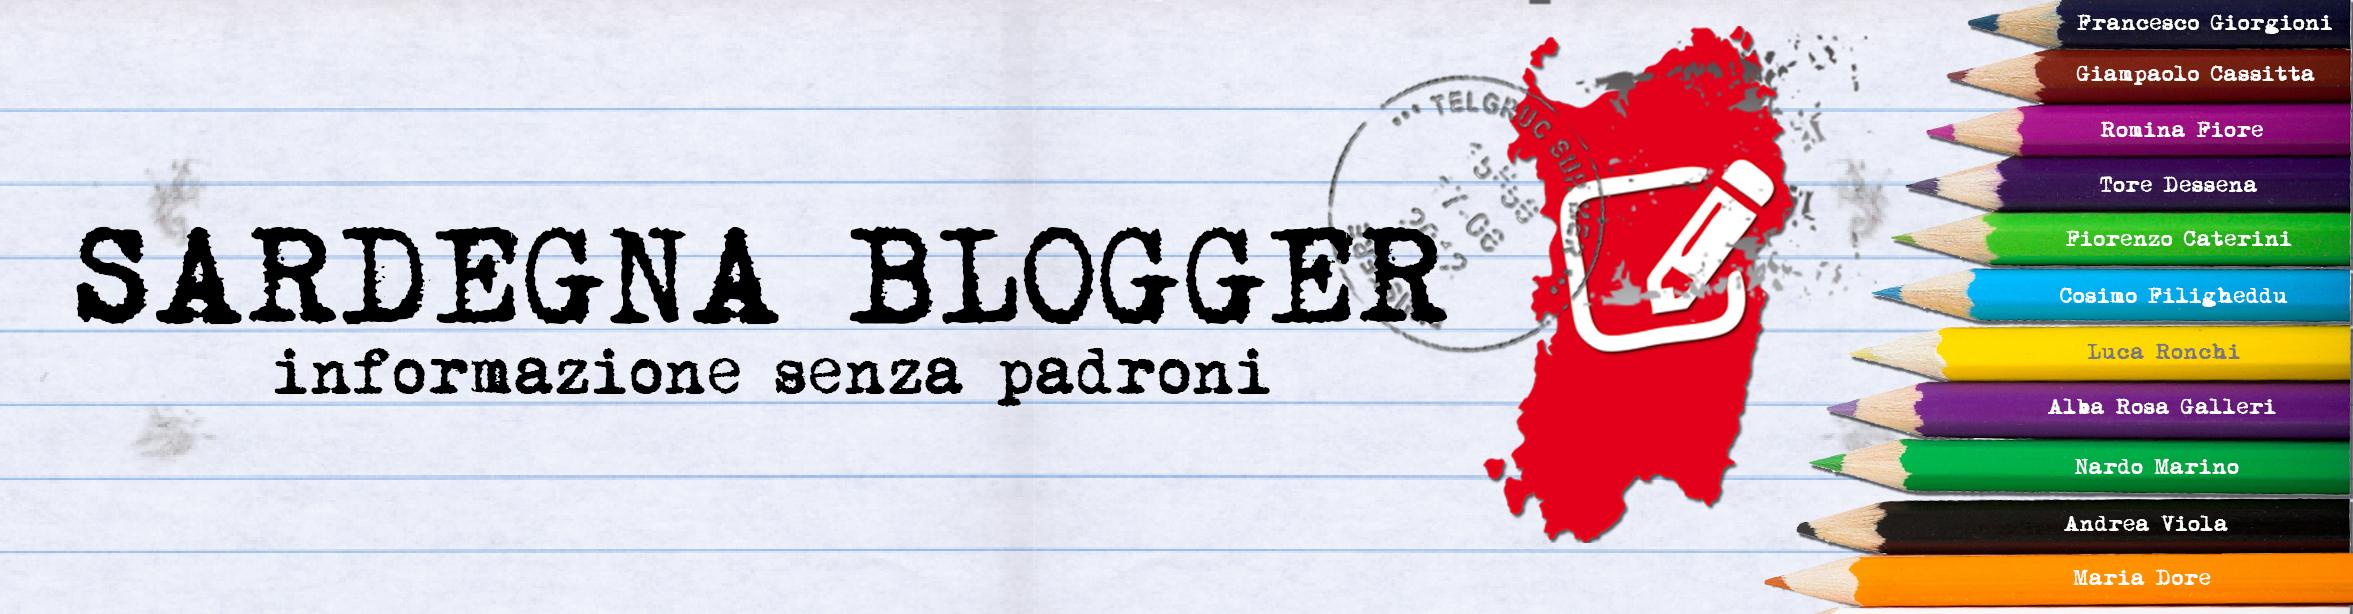 SardegnaBlogger